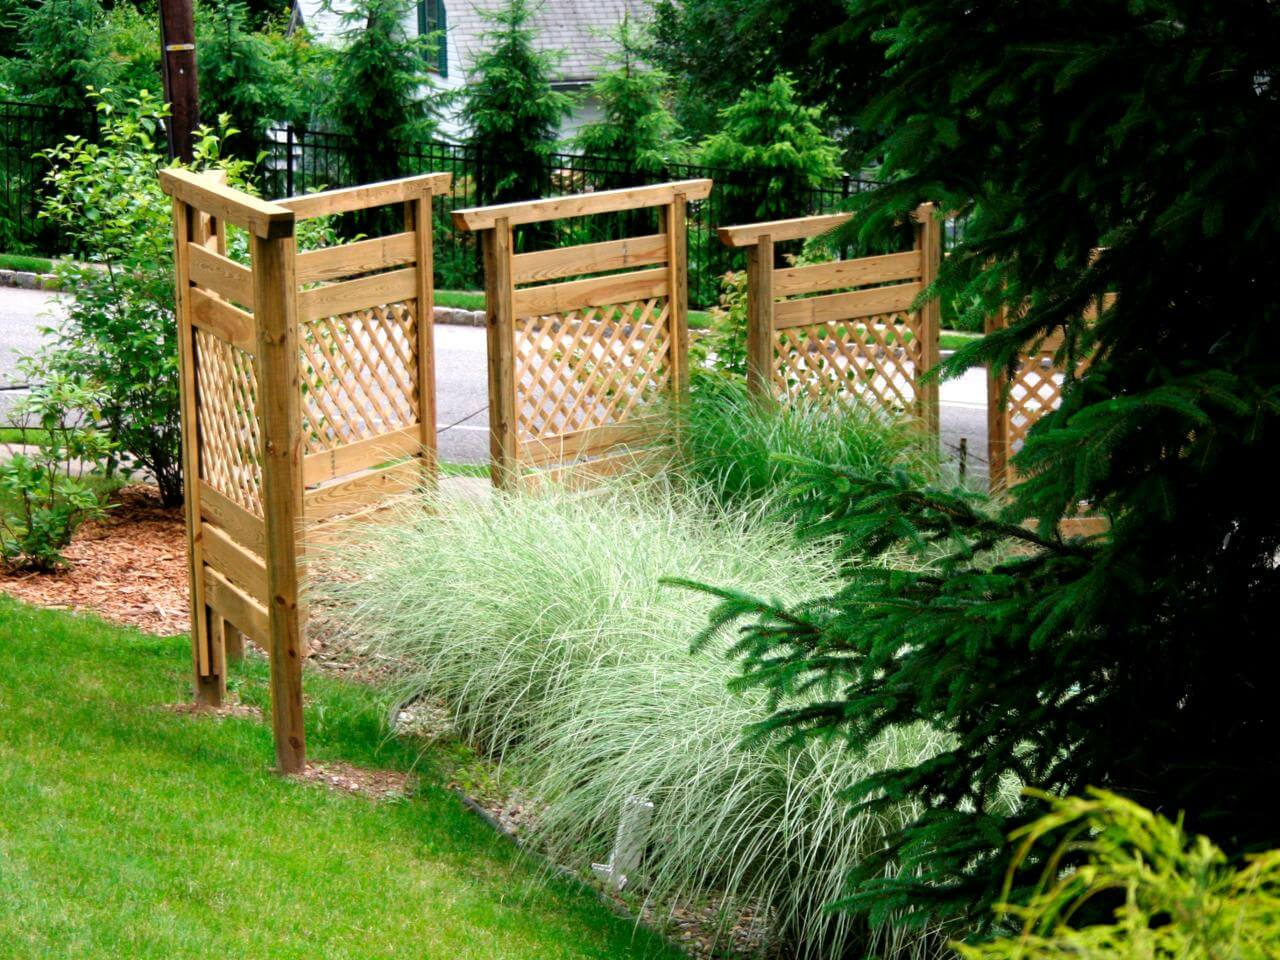 A trio of wooden fences